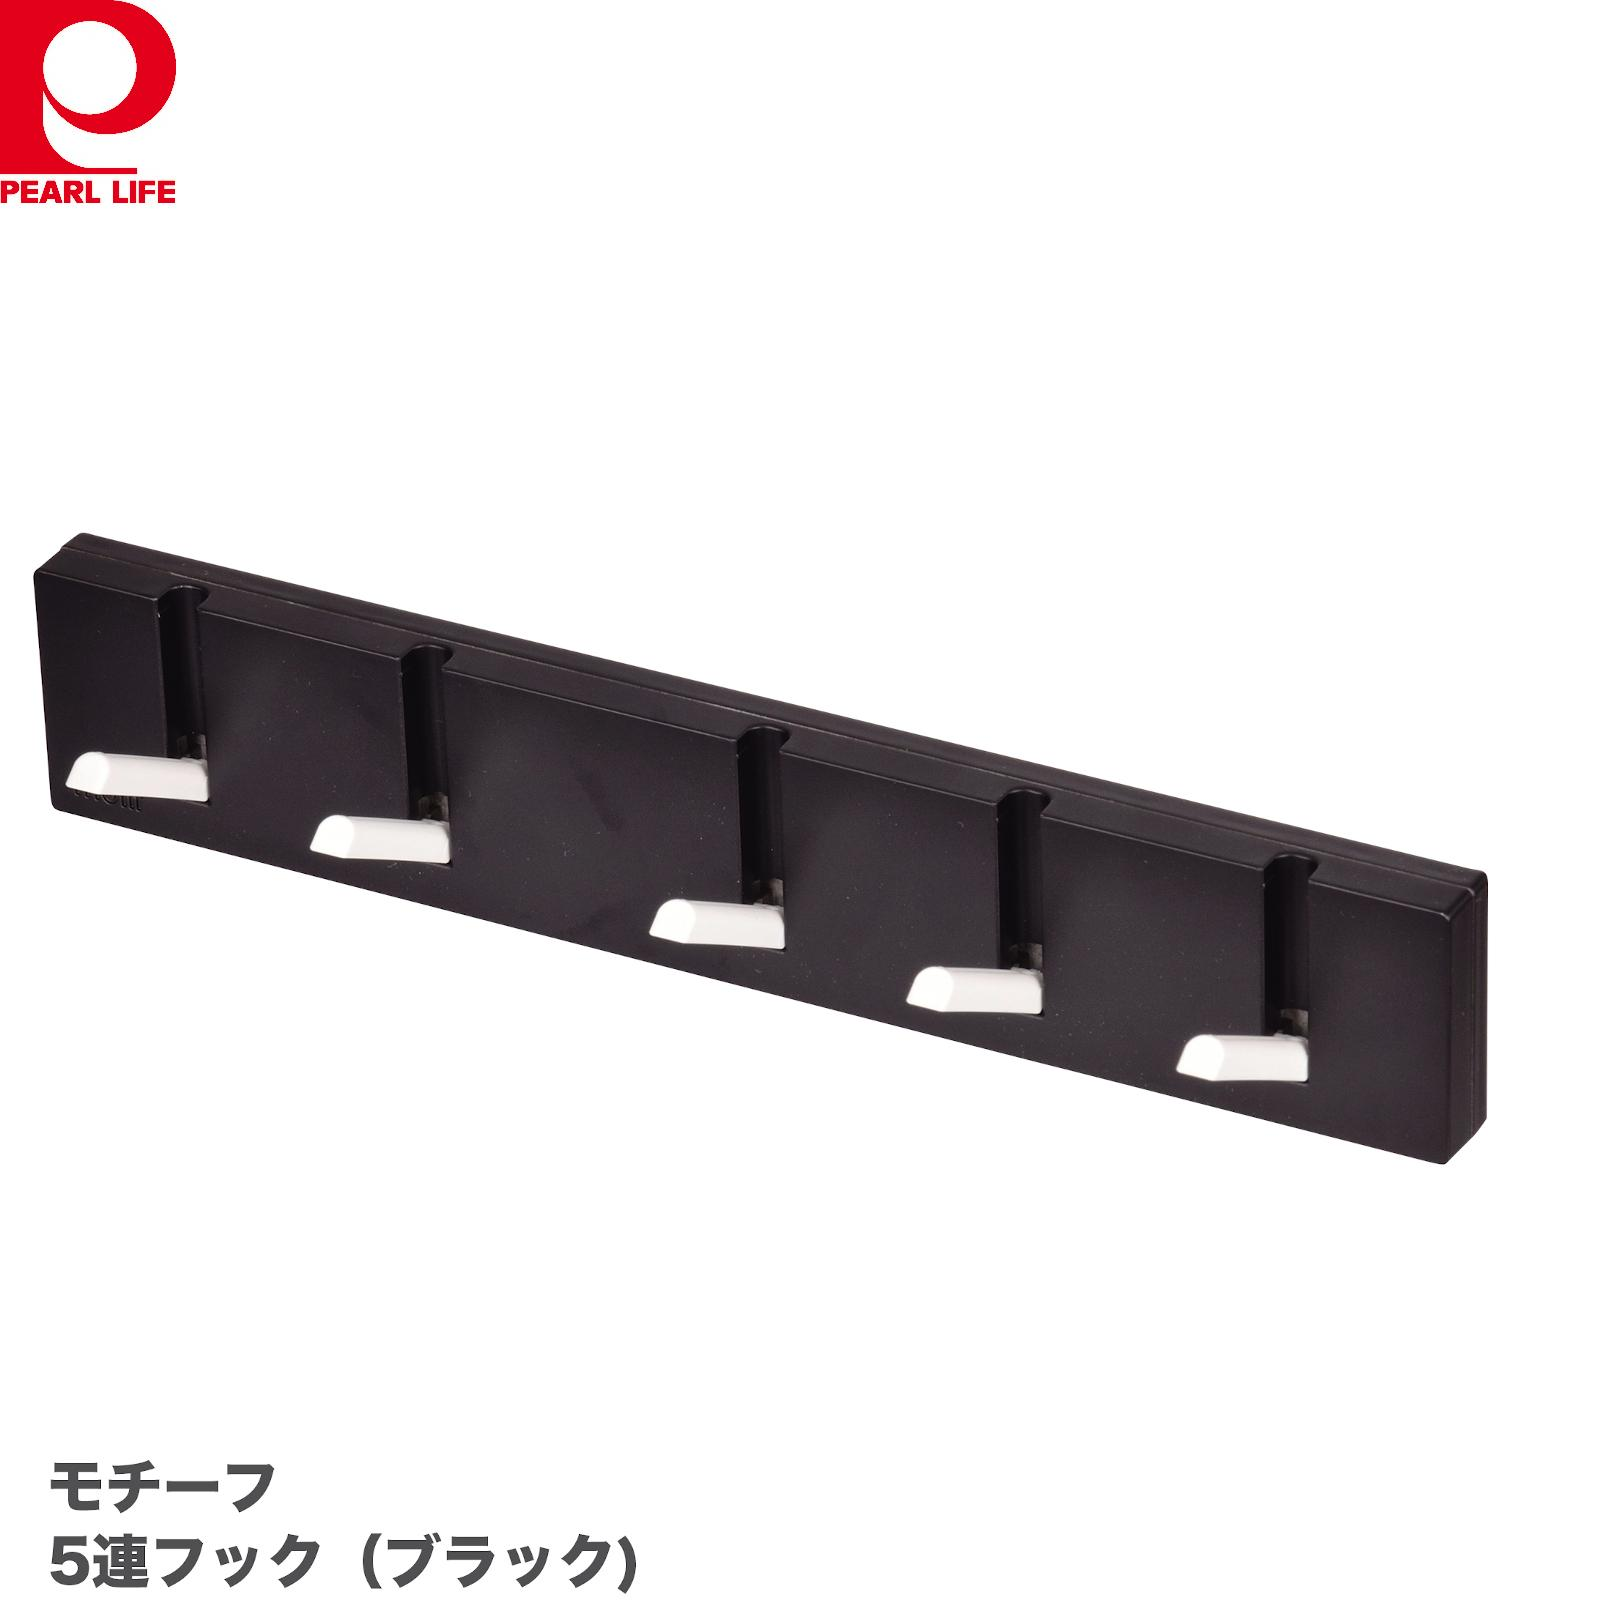 [Japan] Magnetic Kitchen Tool Hook / 5 Hooks / ladle turner tongs organizer storage / Made in Japan